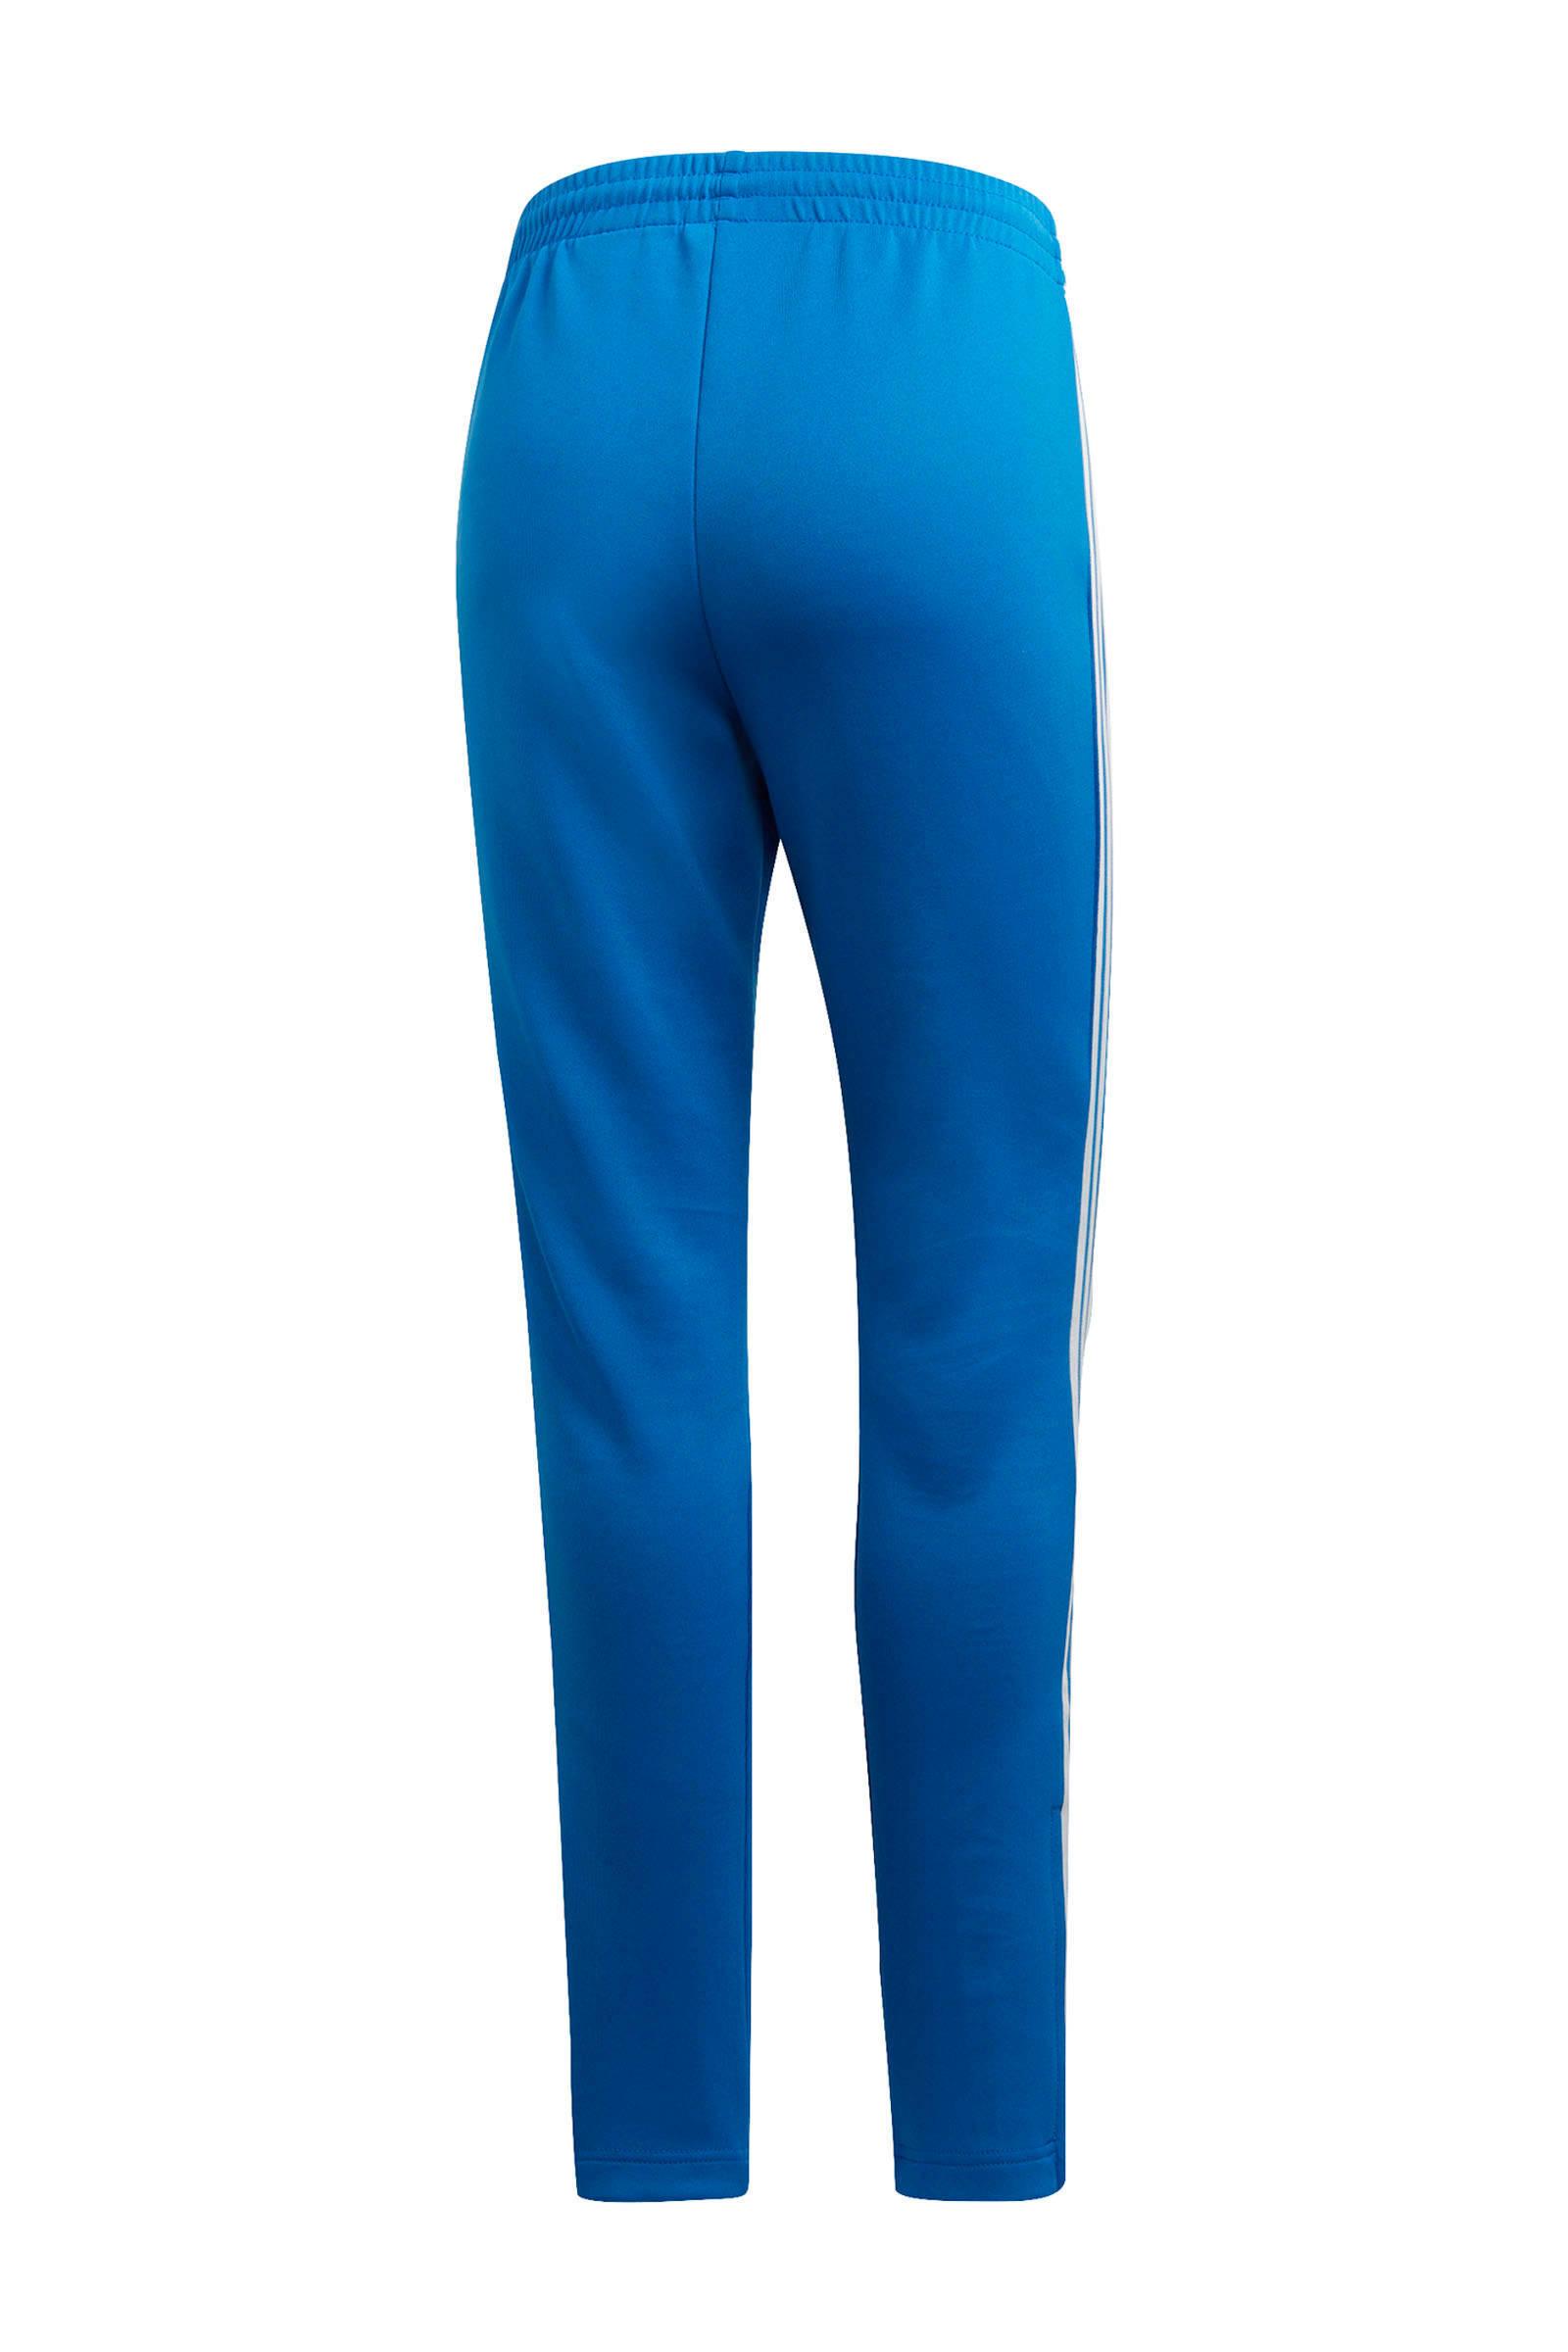 adidas originals Adicolor trainingsbroek blauw | wehkamp